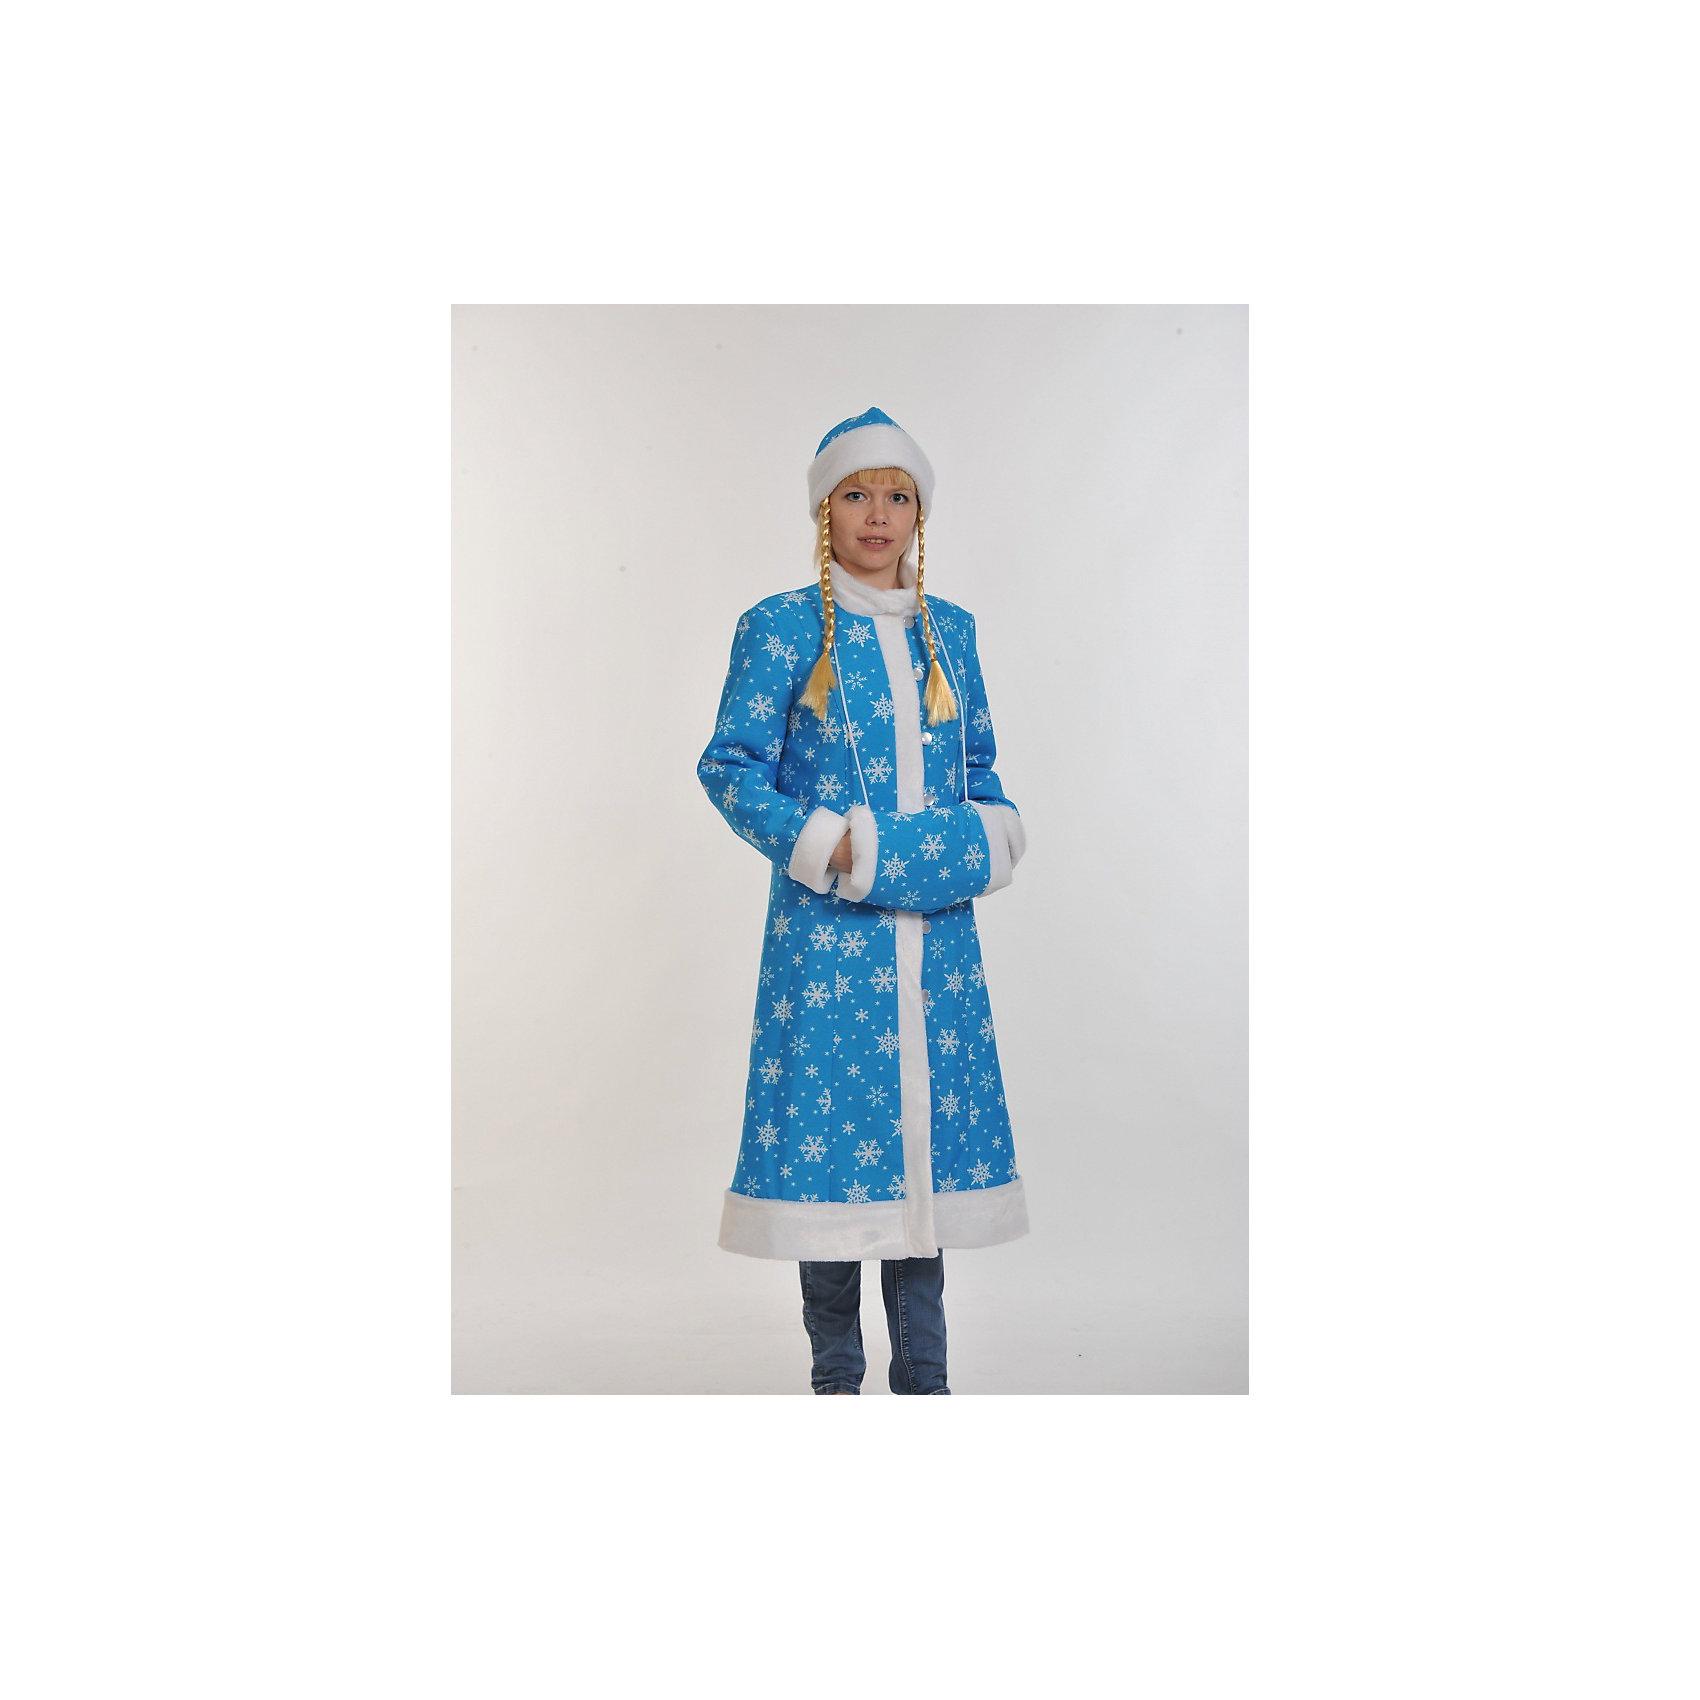 Карнавалофф Костюм Снегурочка МИДИ, размер M 46-48/170, Карнавалофф костюм красотки канкана 46 48